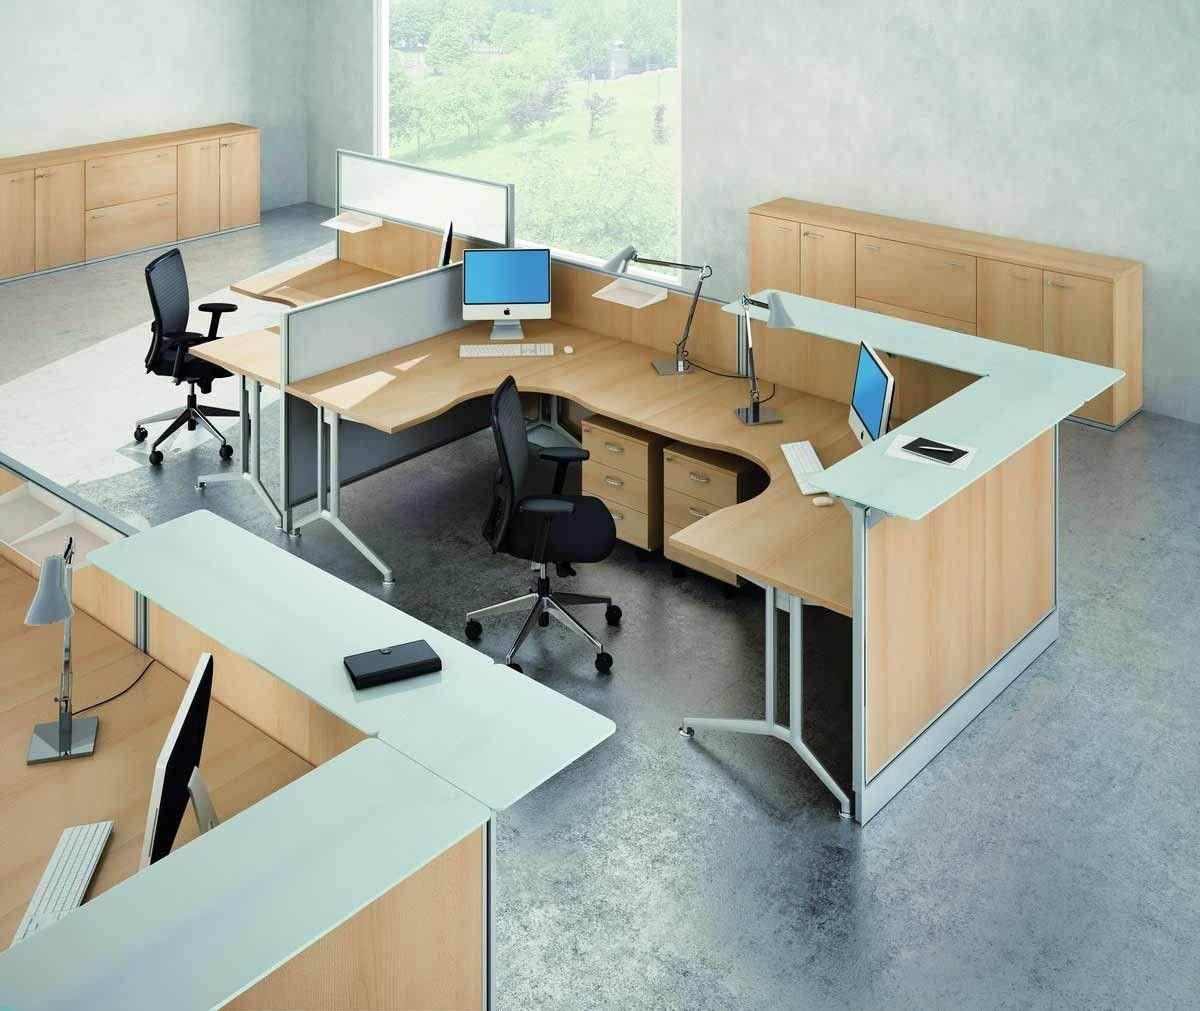 Pin by Erlangfahresi on desk office design | Desk, Home ...